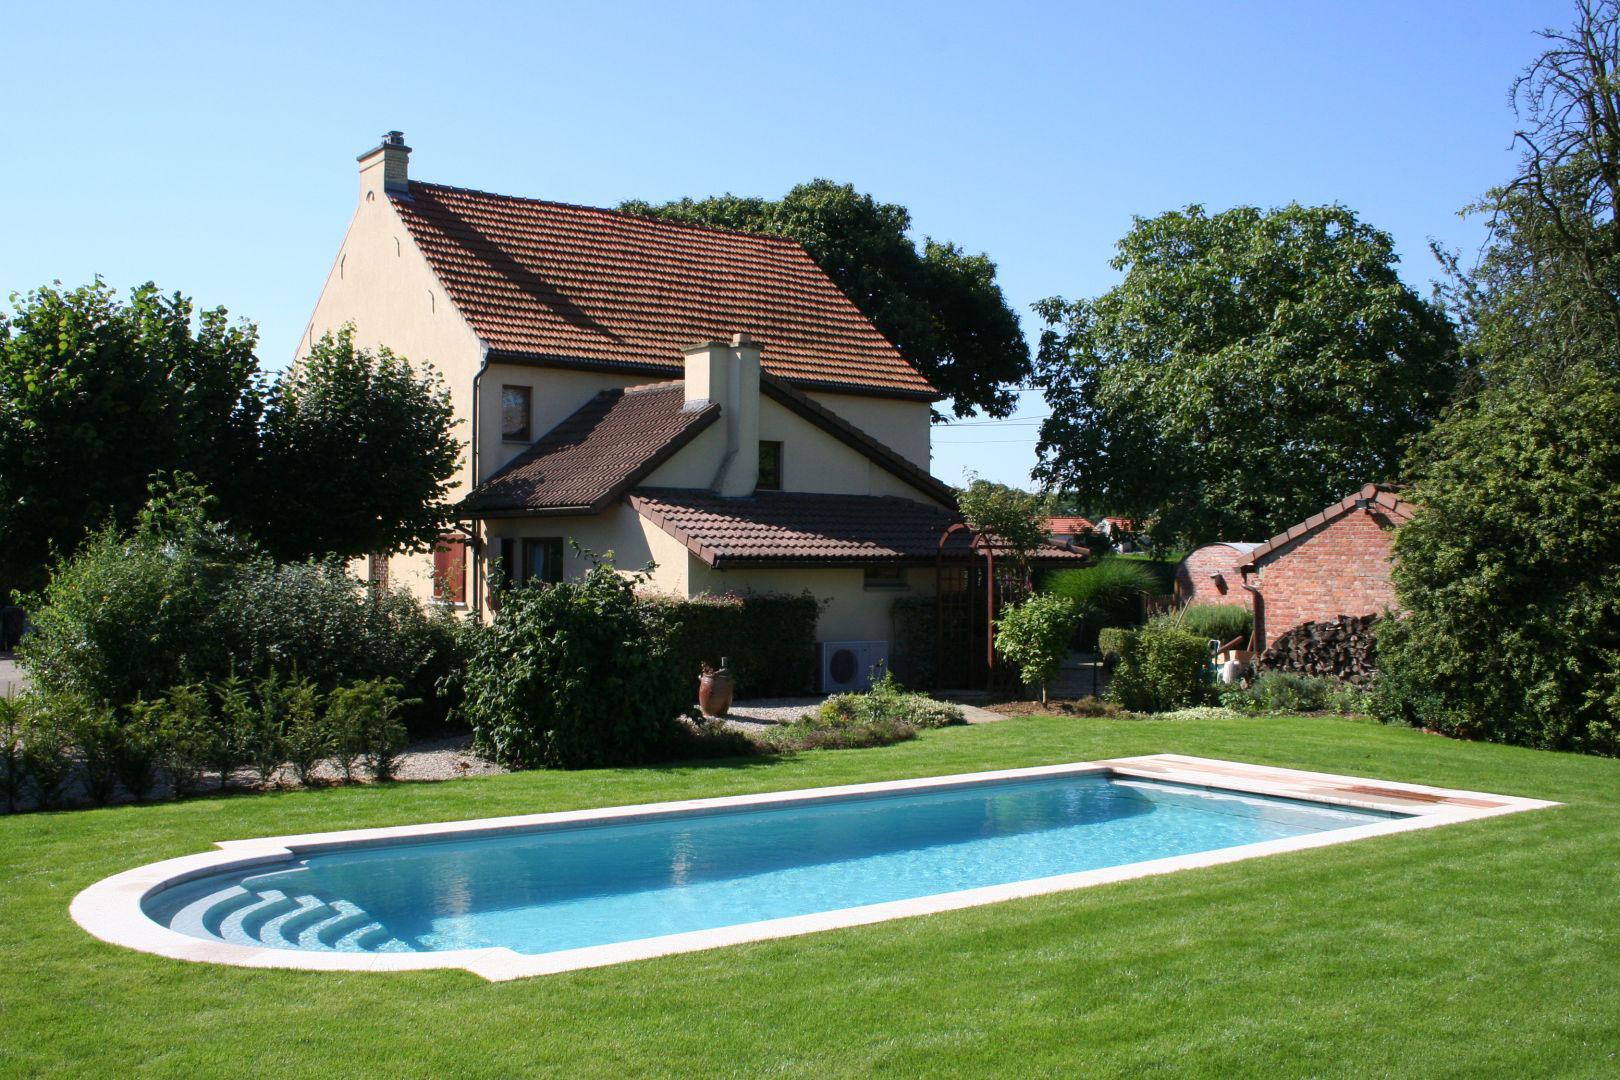 LPW Pool back garden UK